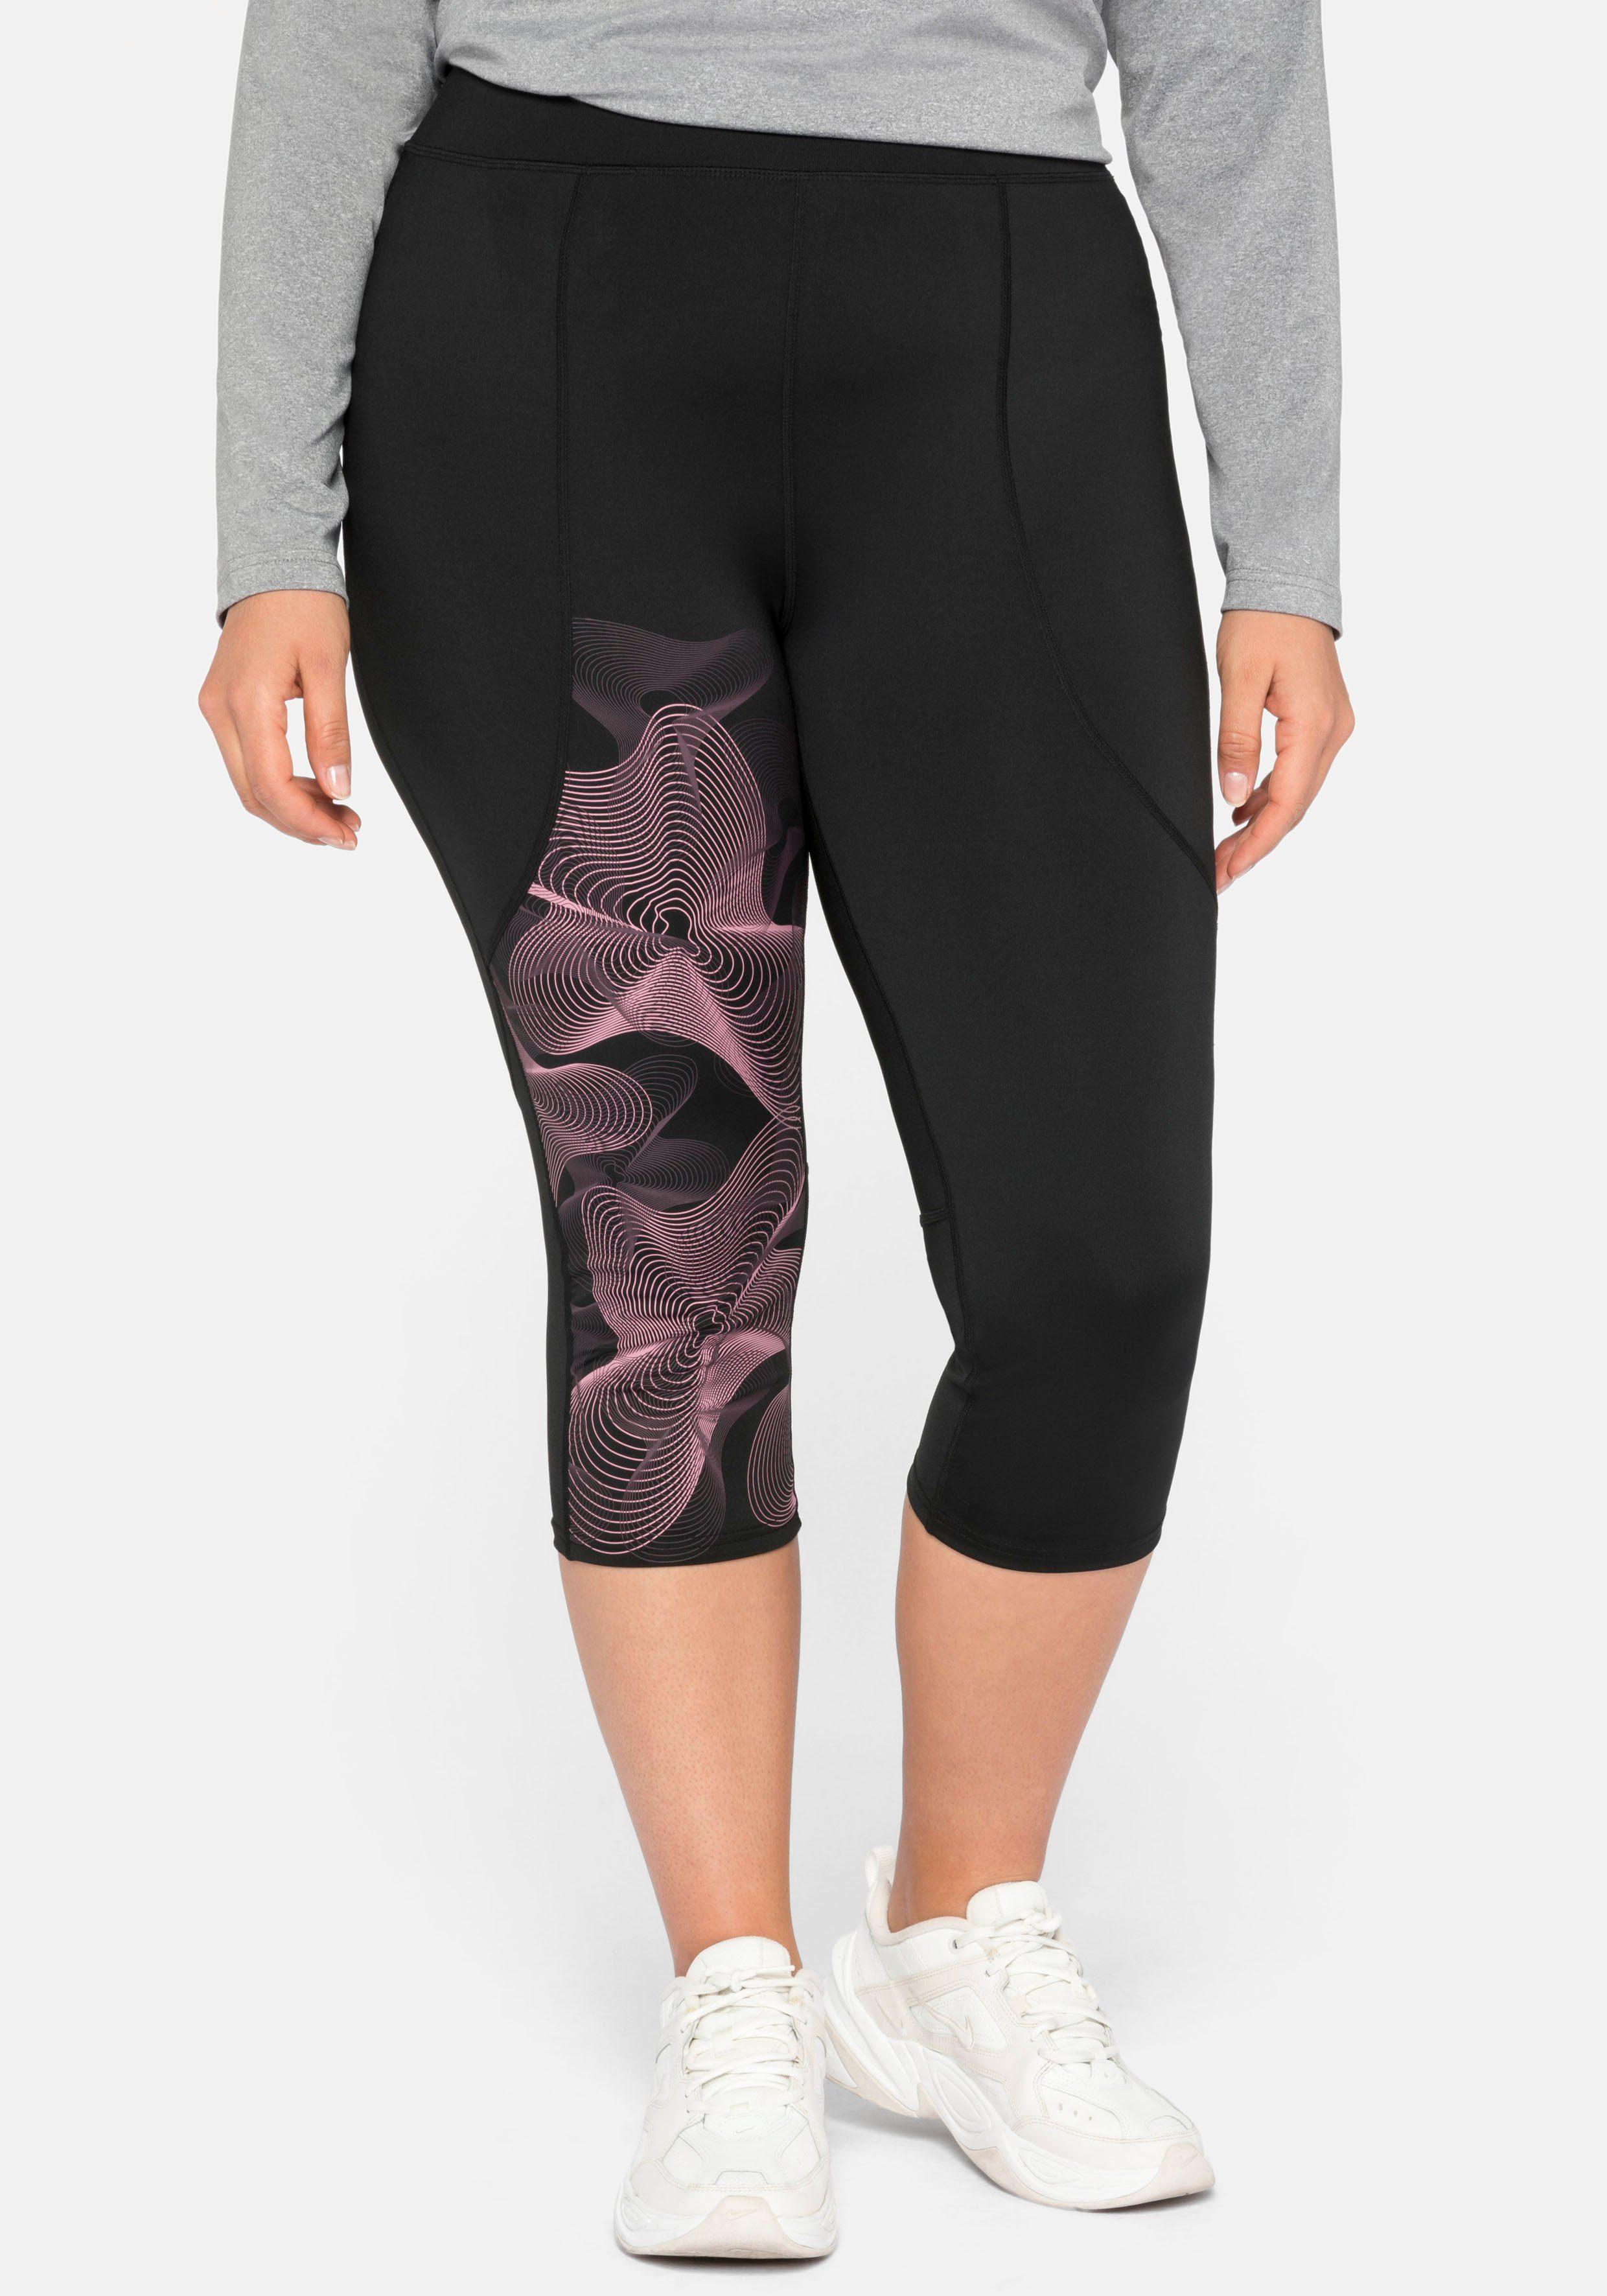 Me TURQUO Damen Hose Leggings Trainingshose Sporthose Reebok lux Bold Tight